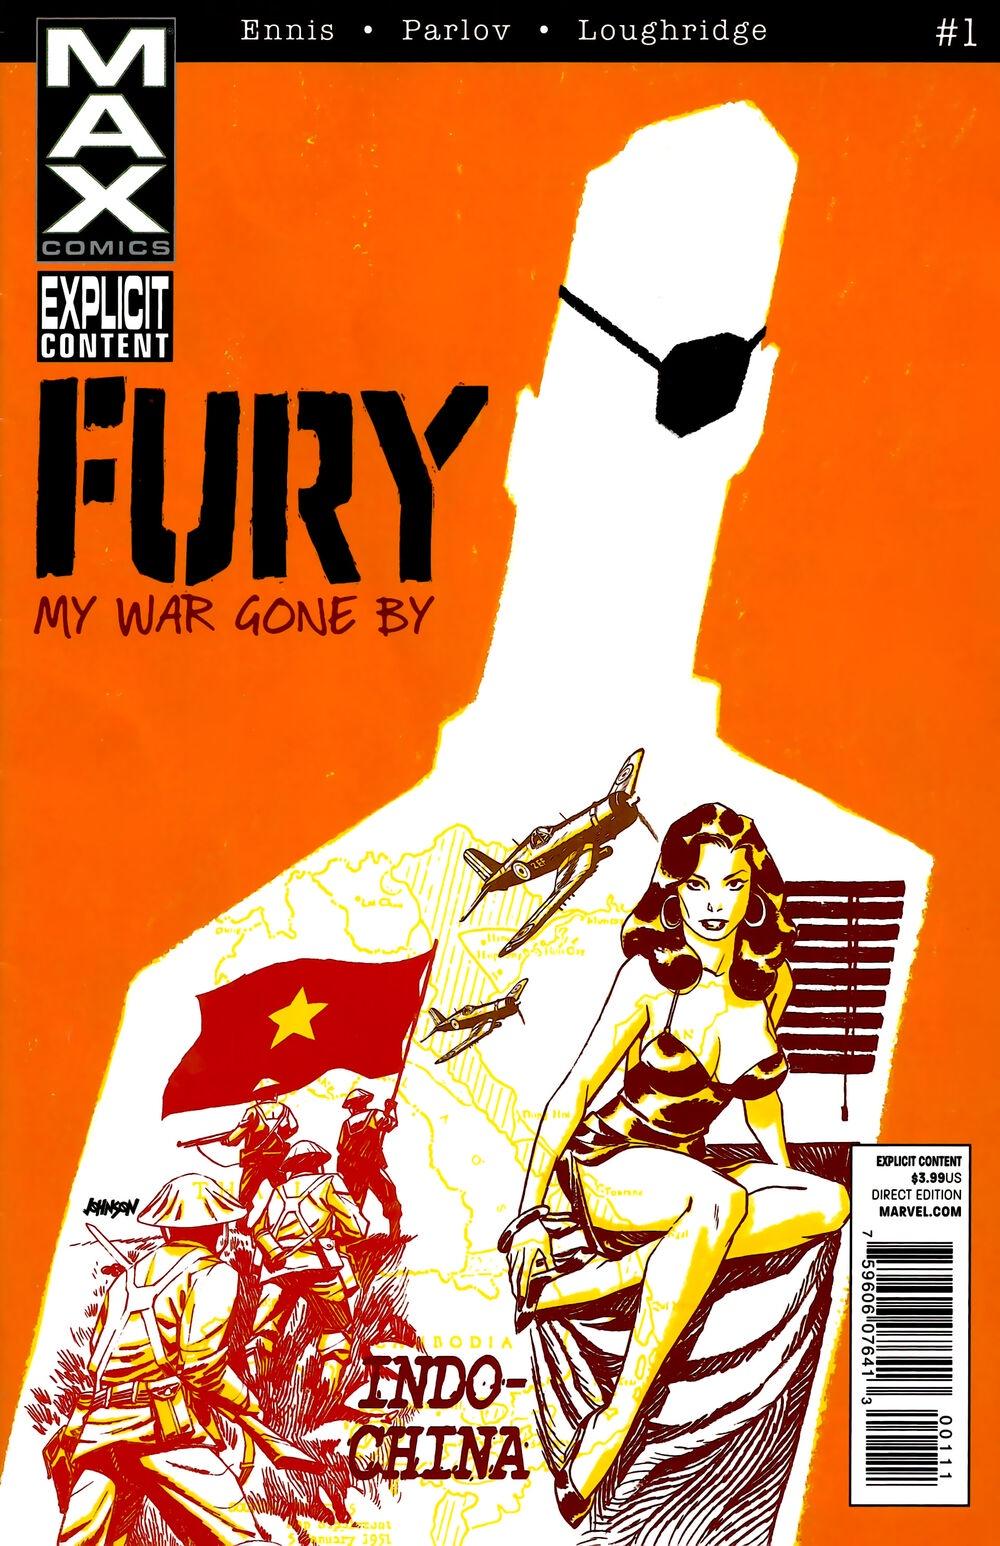 Ennis Parlov Loughridge Fury Max (2012 Marvel) #1 kenyon s born of fury